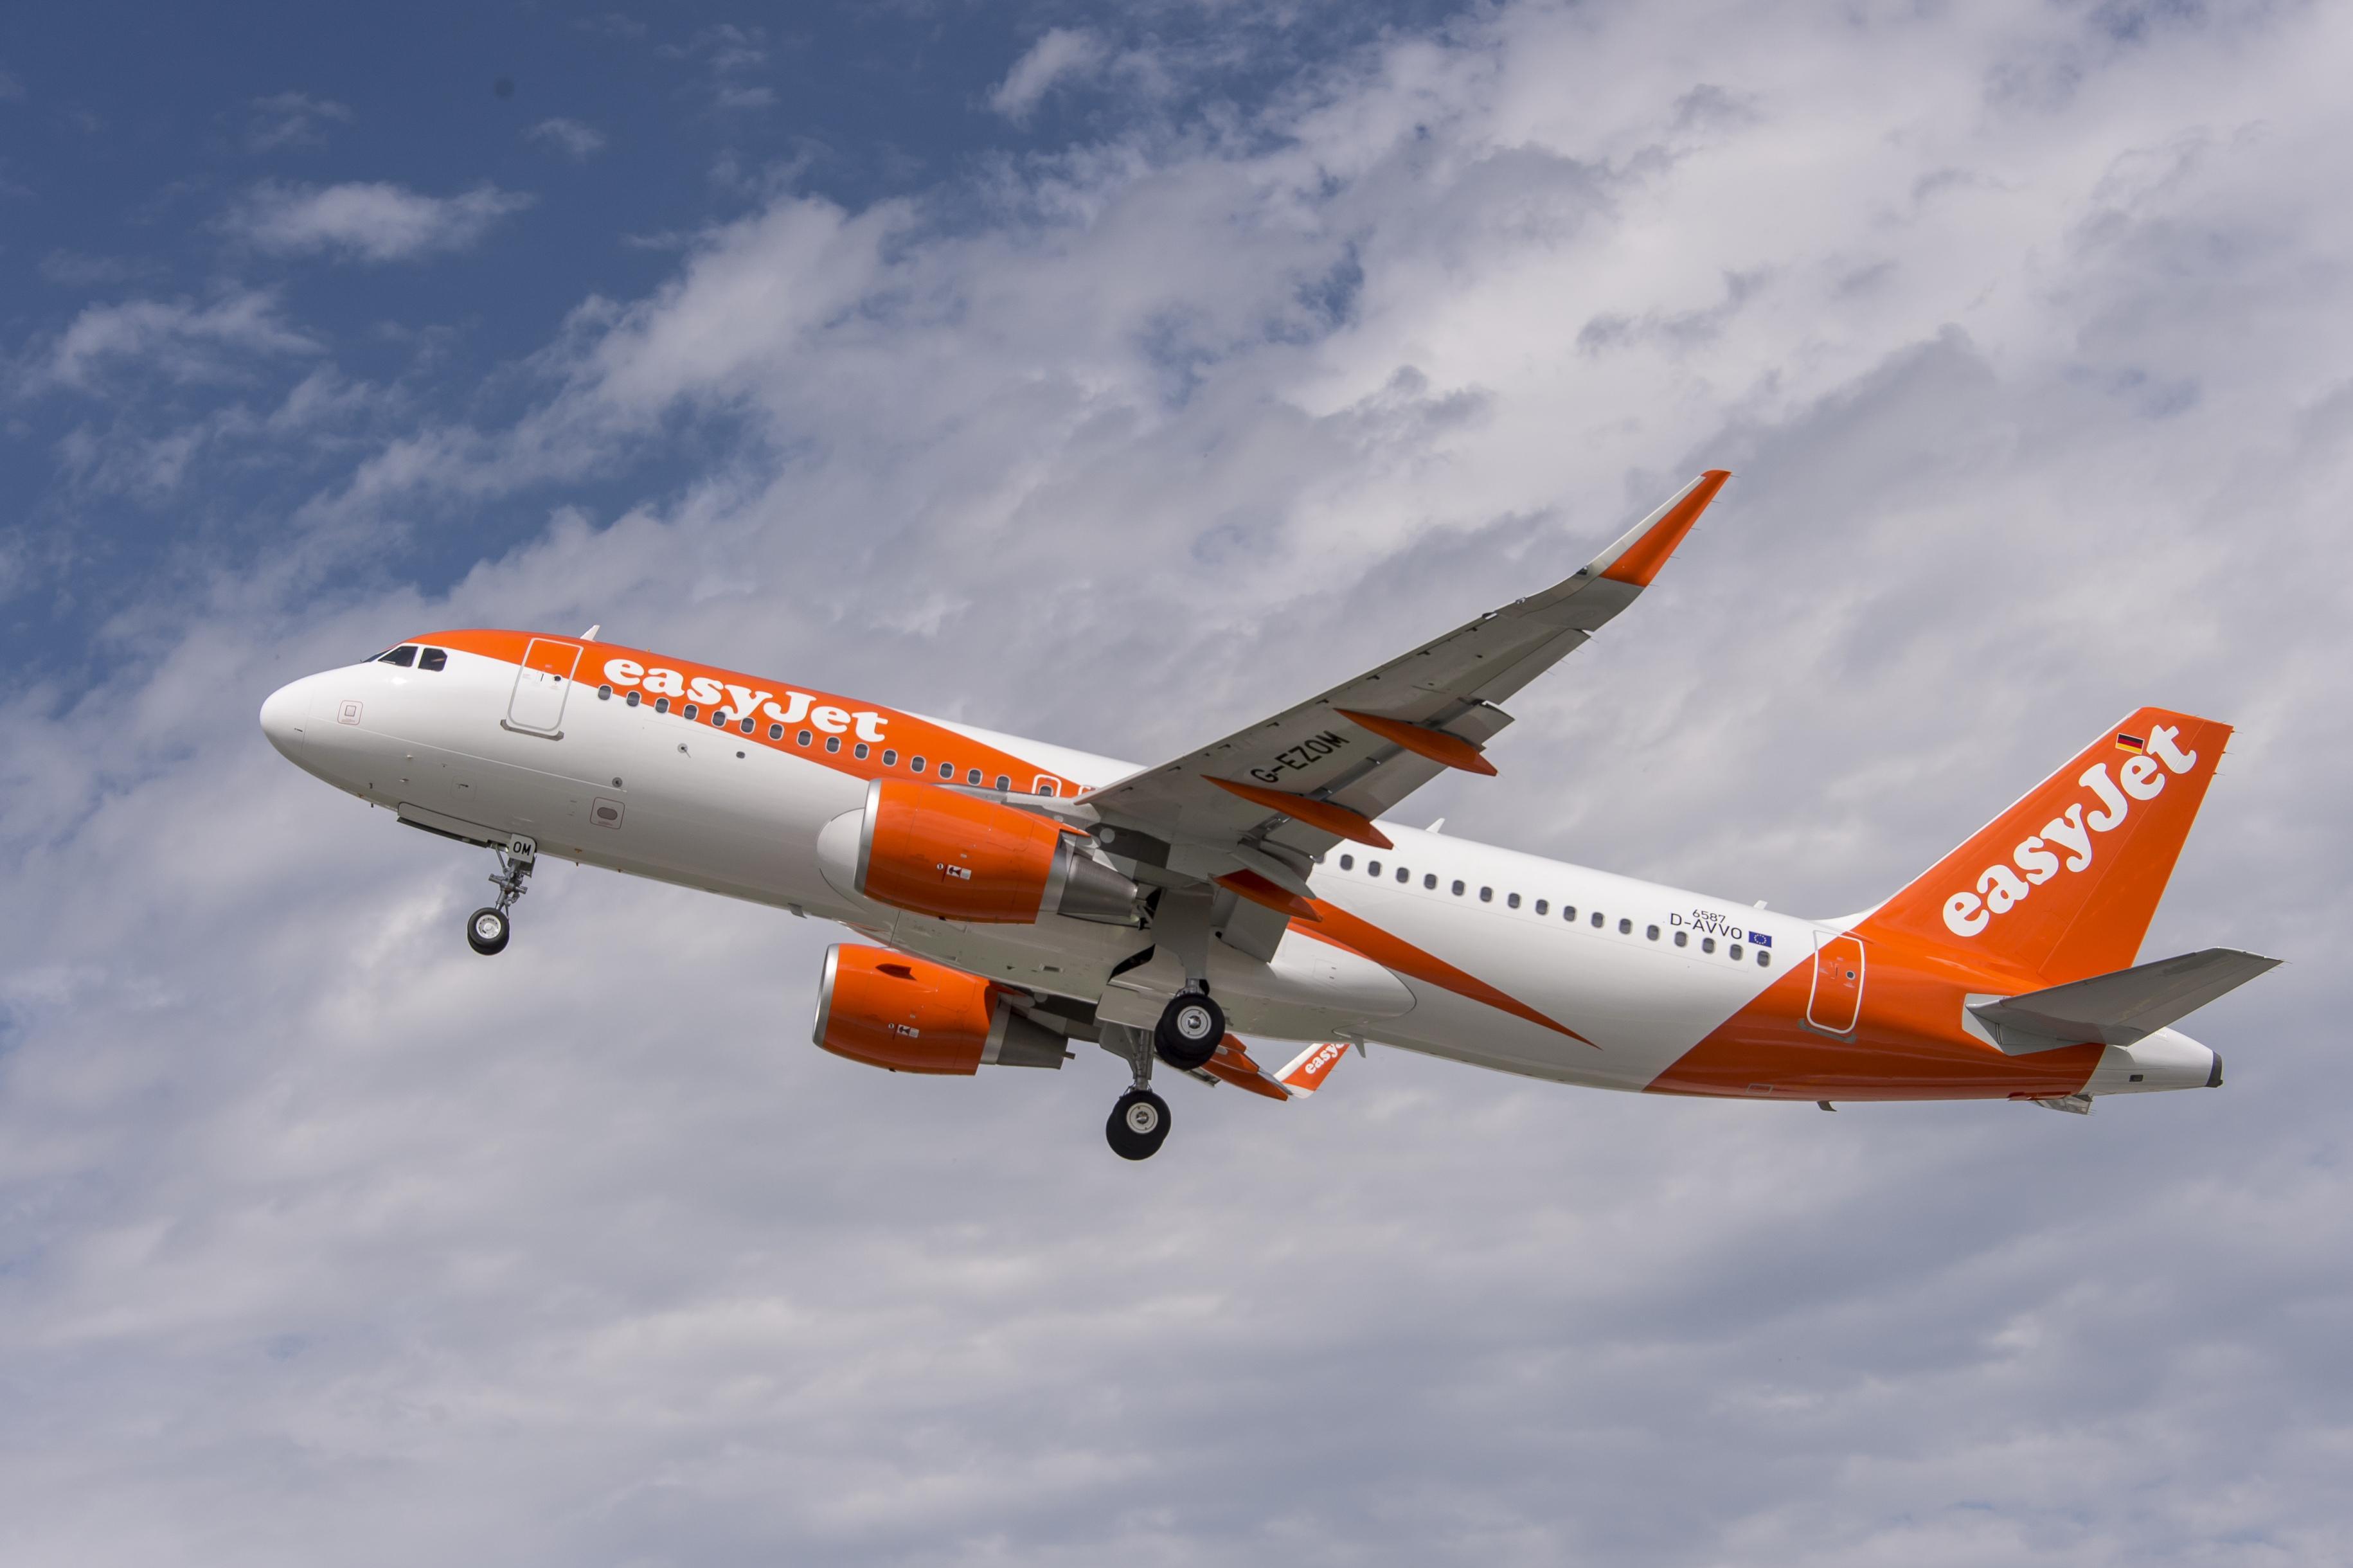 A320_easyJet_new_livery_2015